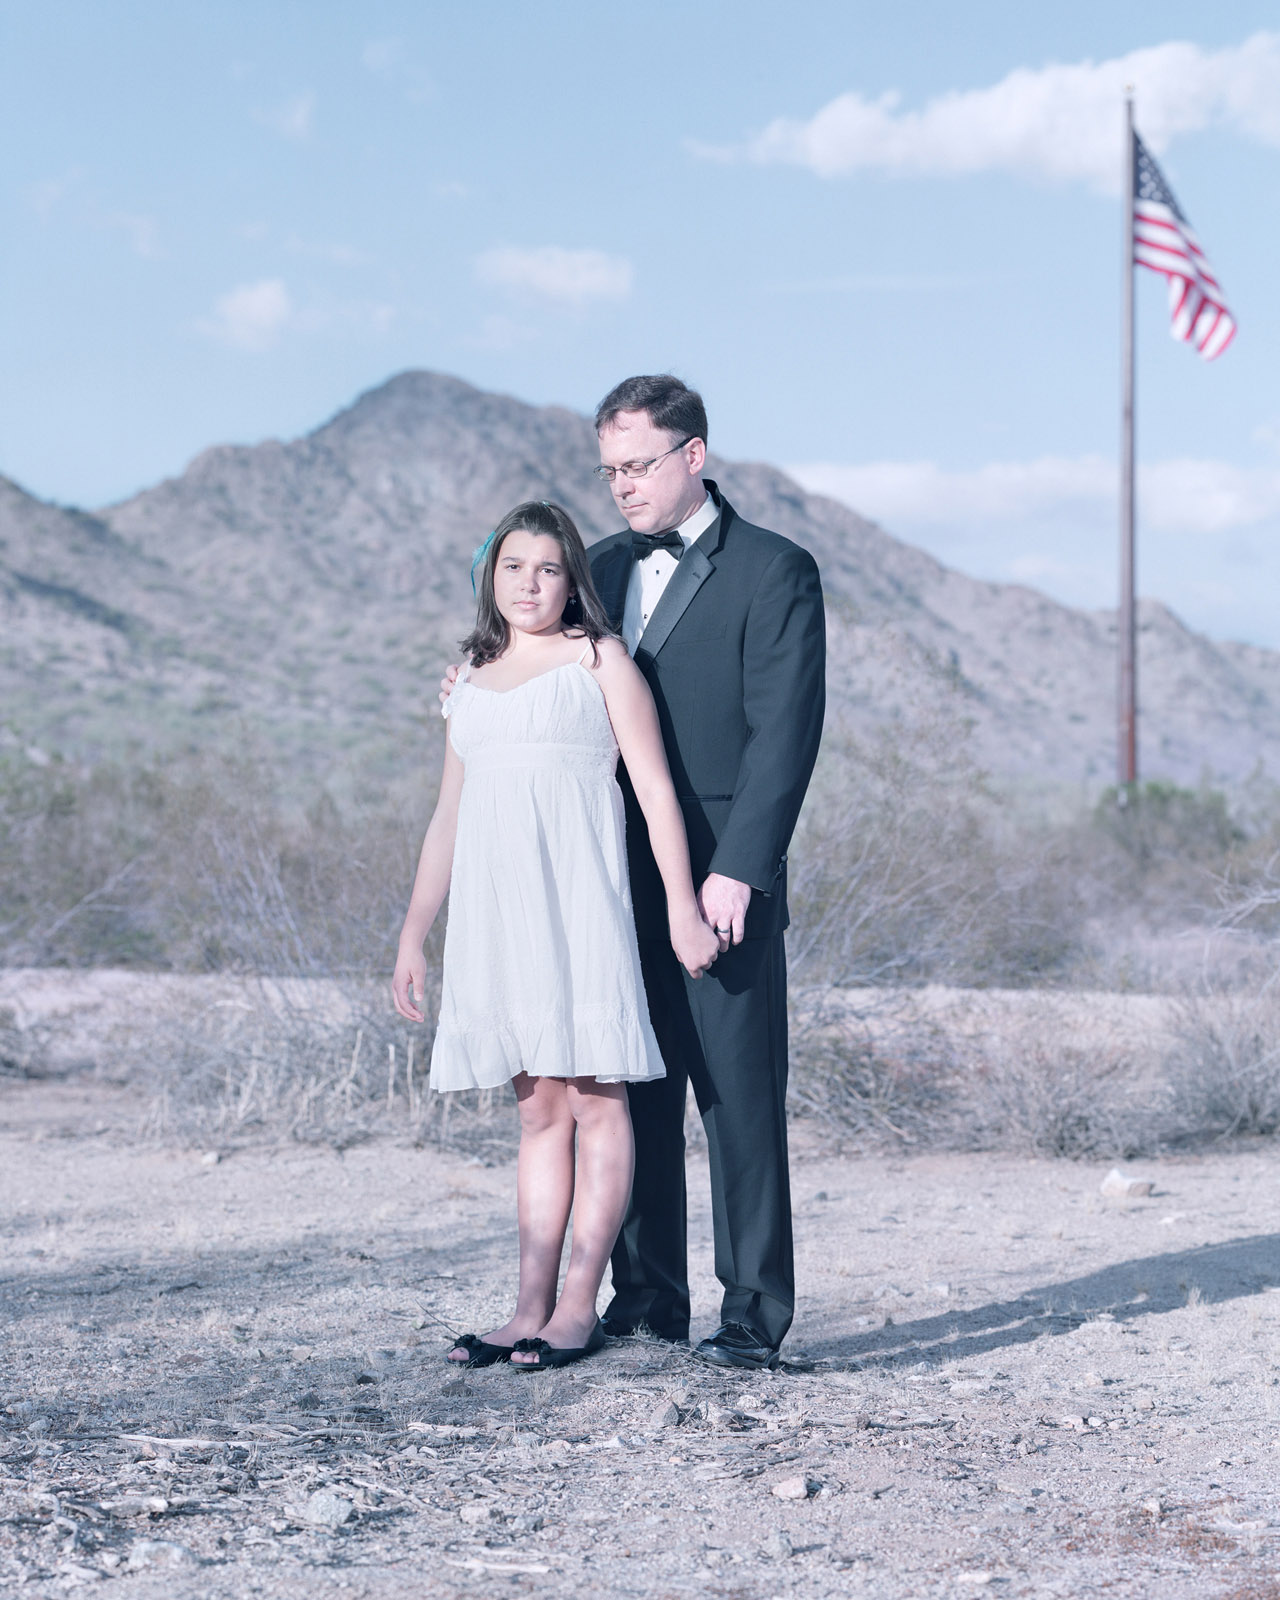 Jenna & Jeff Clark, Chandler, Arizona